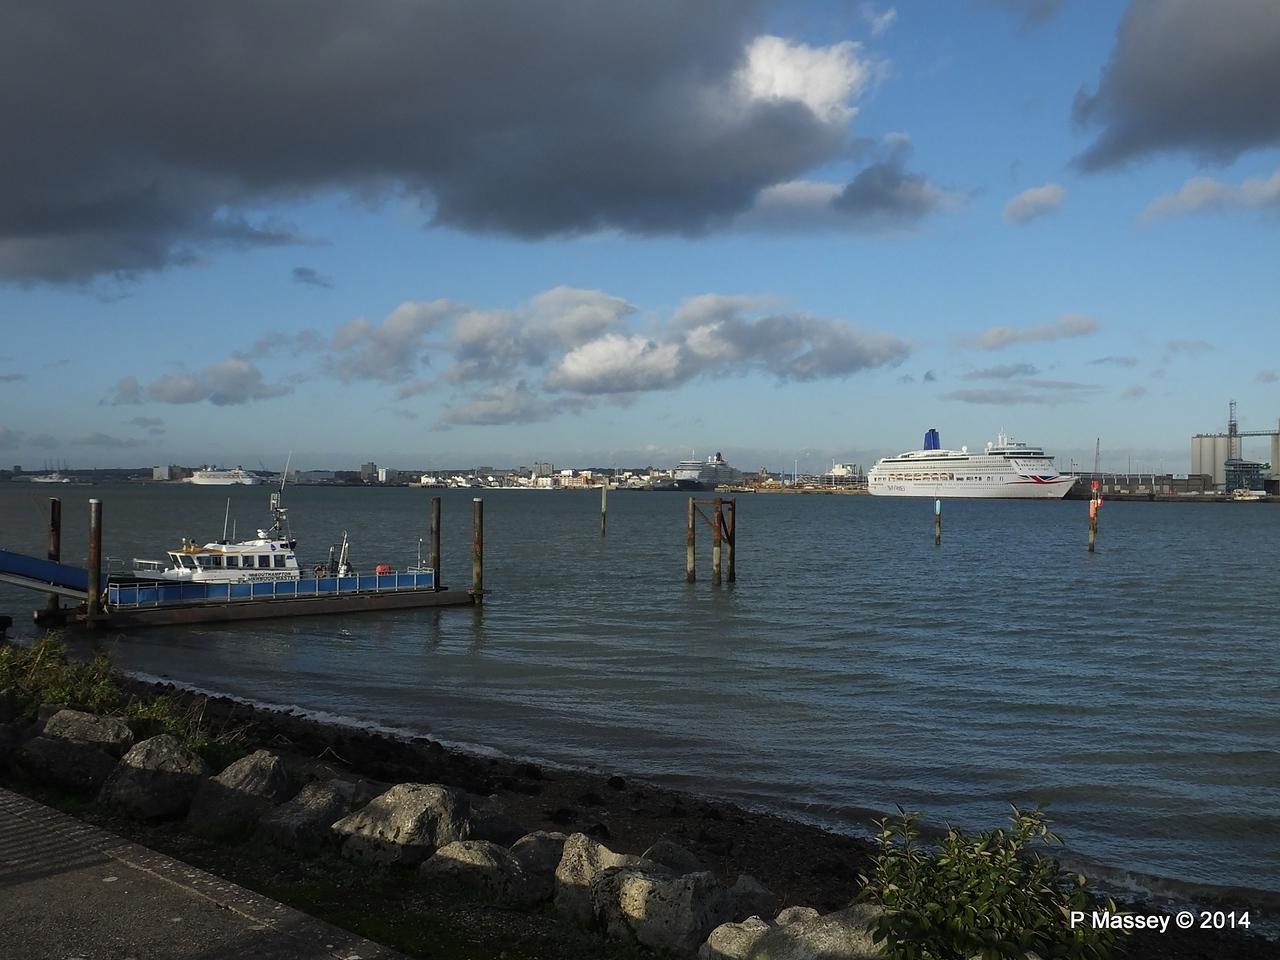 AURORA QUEEN ELIZABETH BALMORAL Southampton PDM 19-12-2014 13-59-18